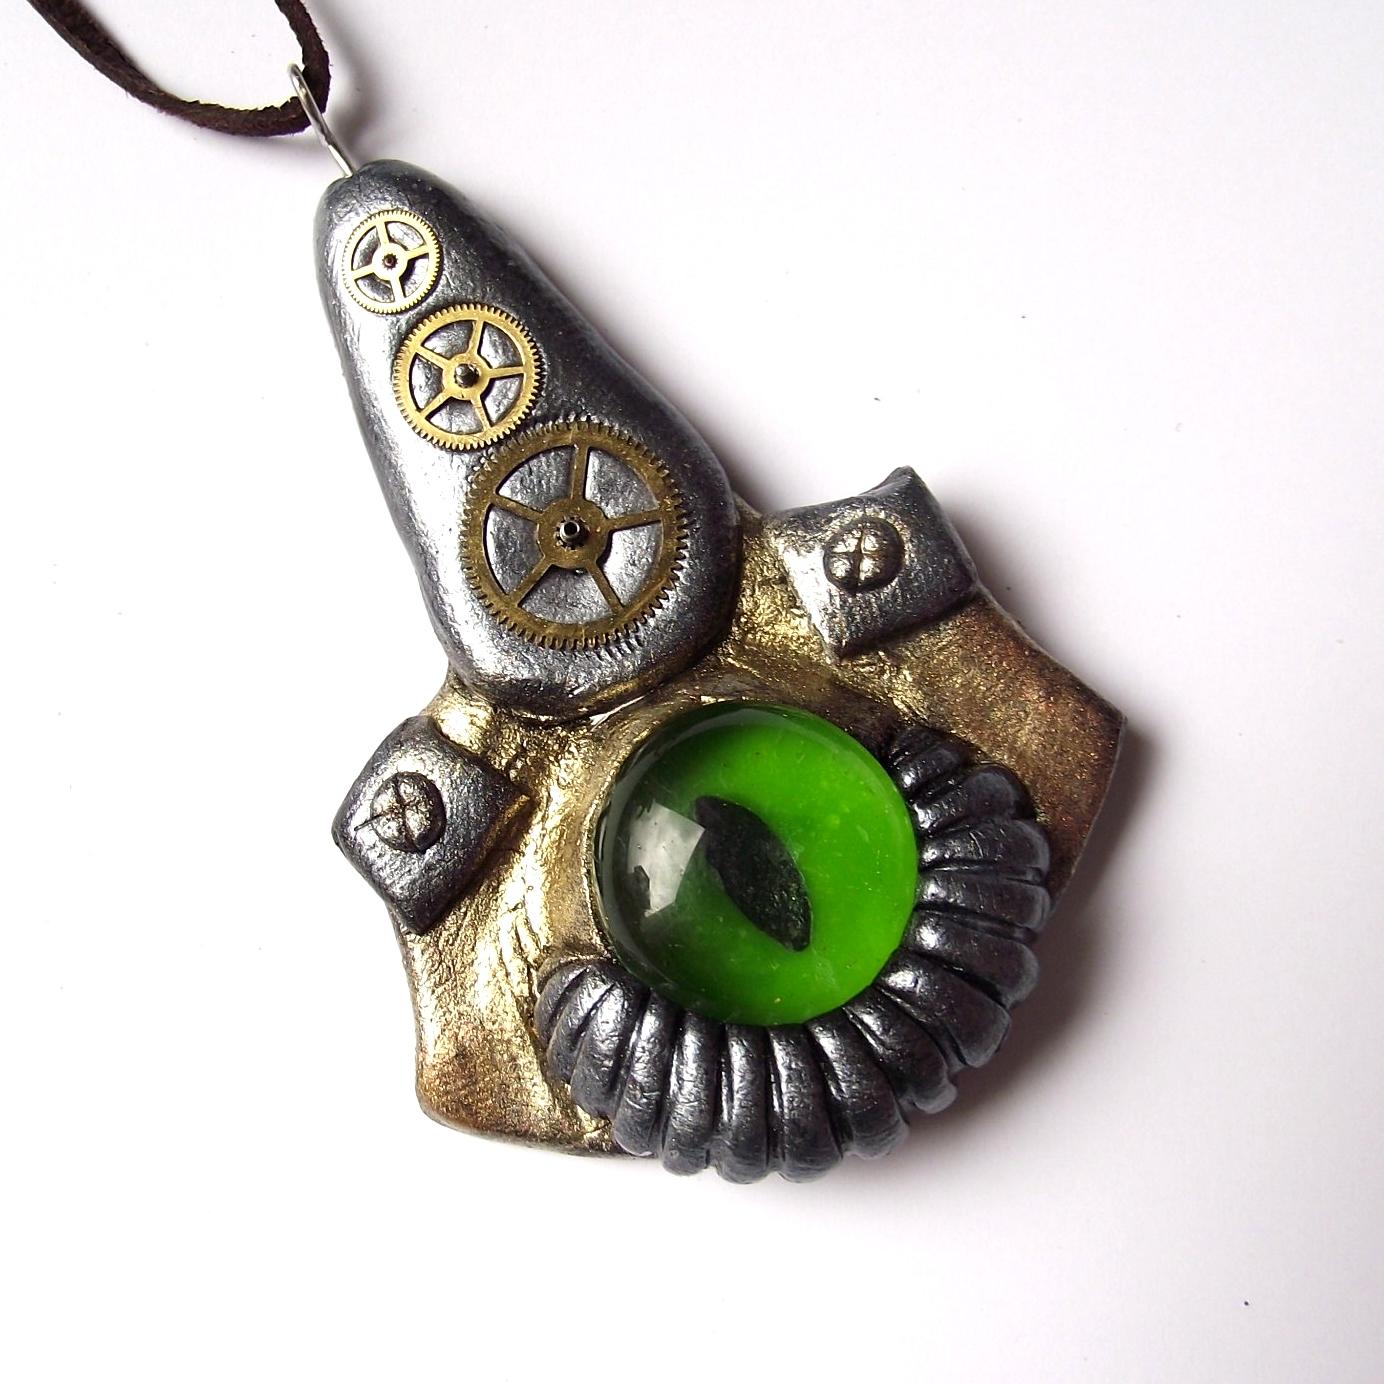 6534a47a69c Time machine jewellery - Stroje času